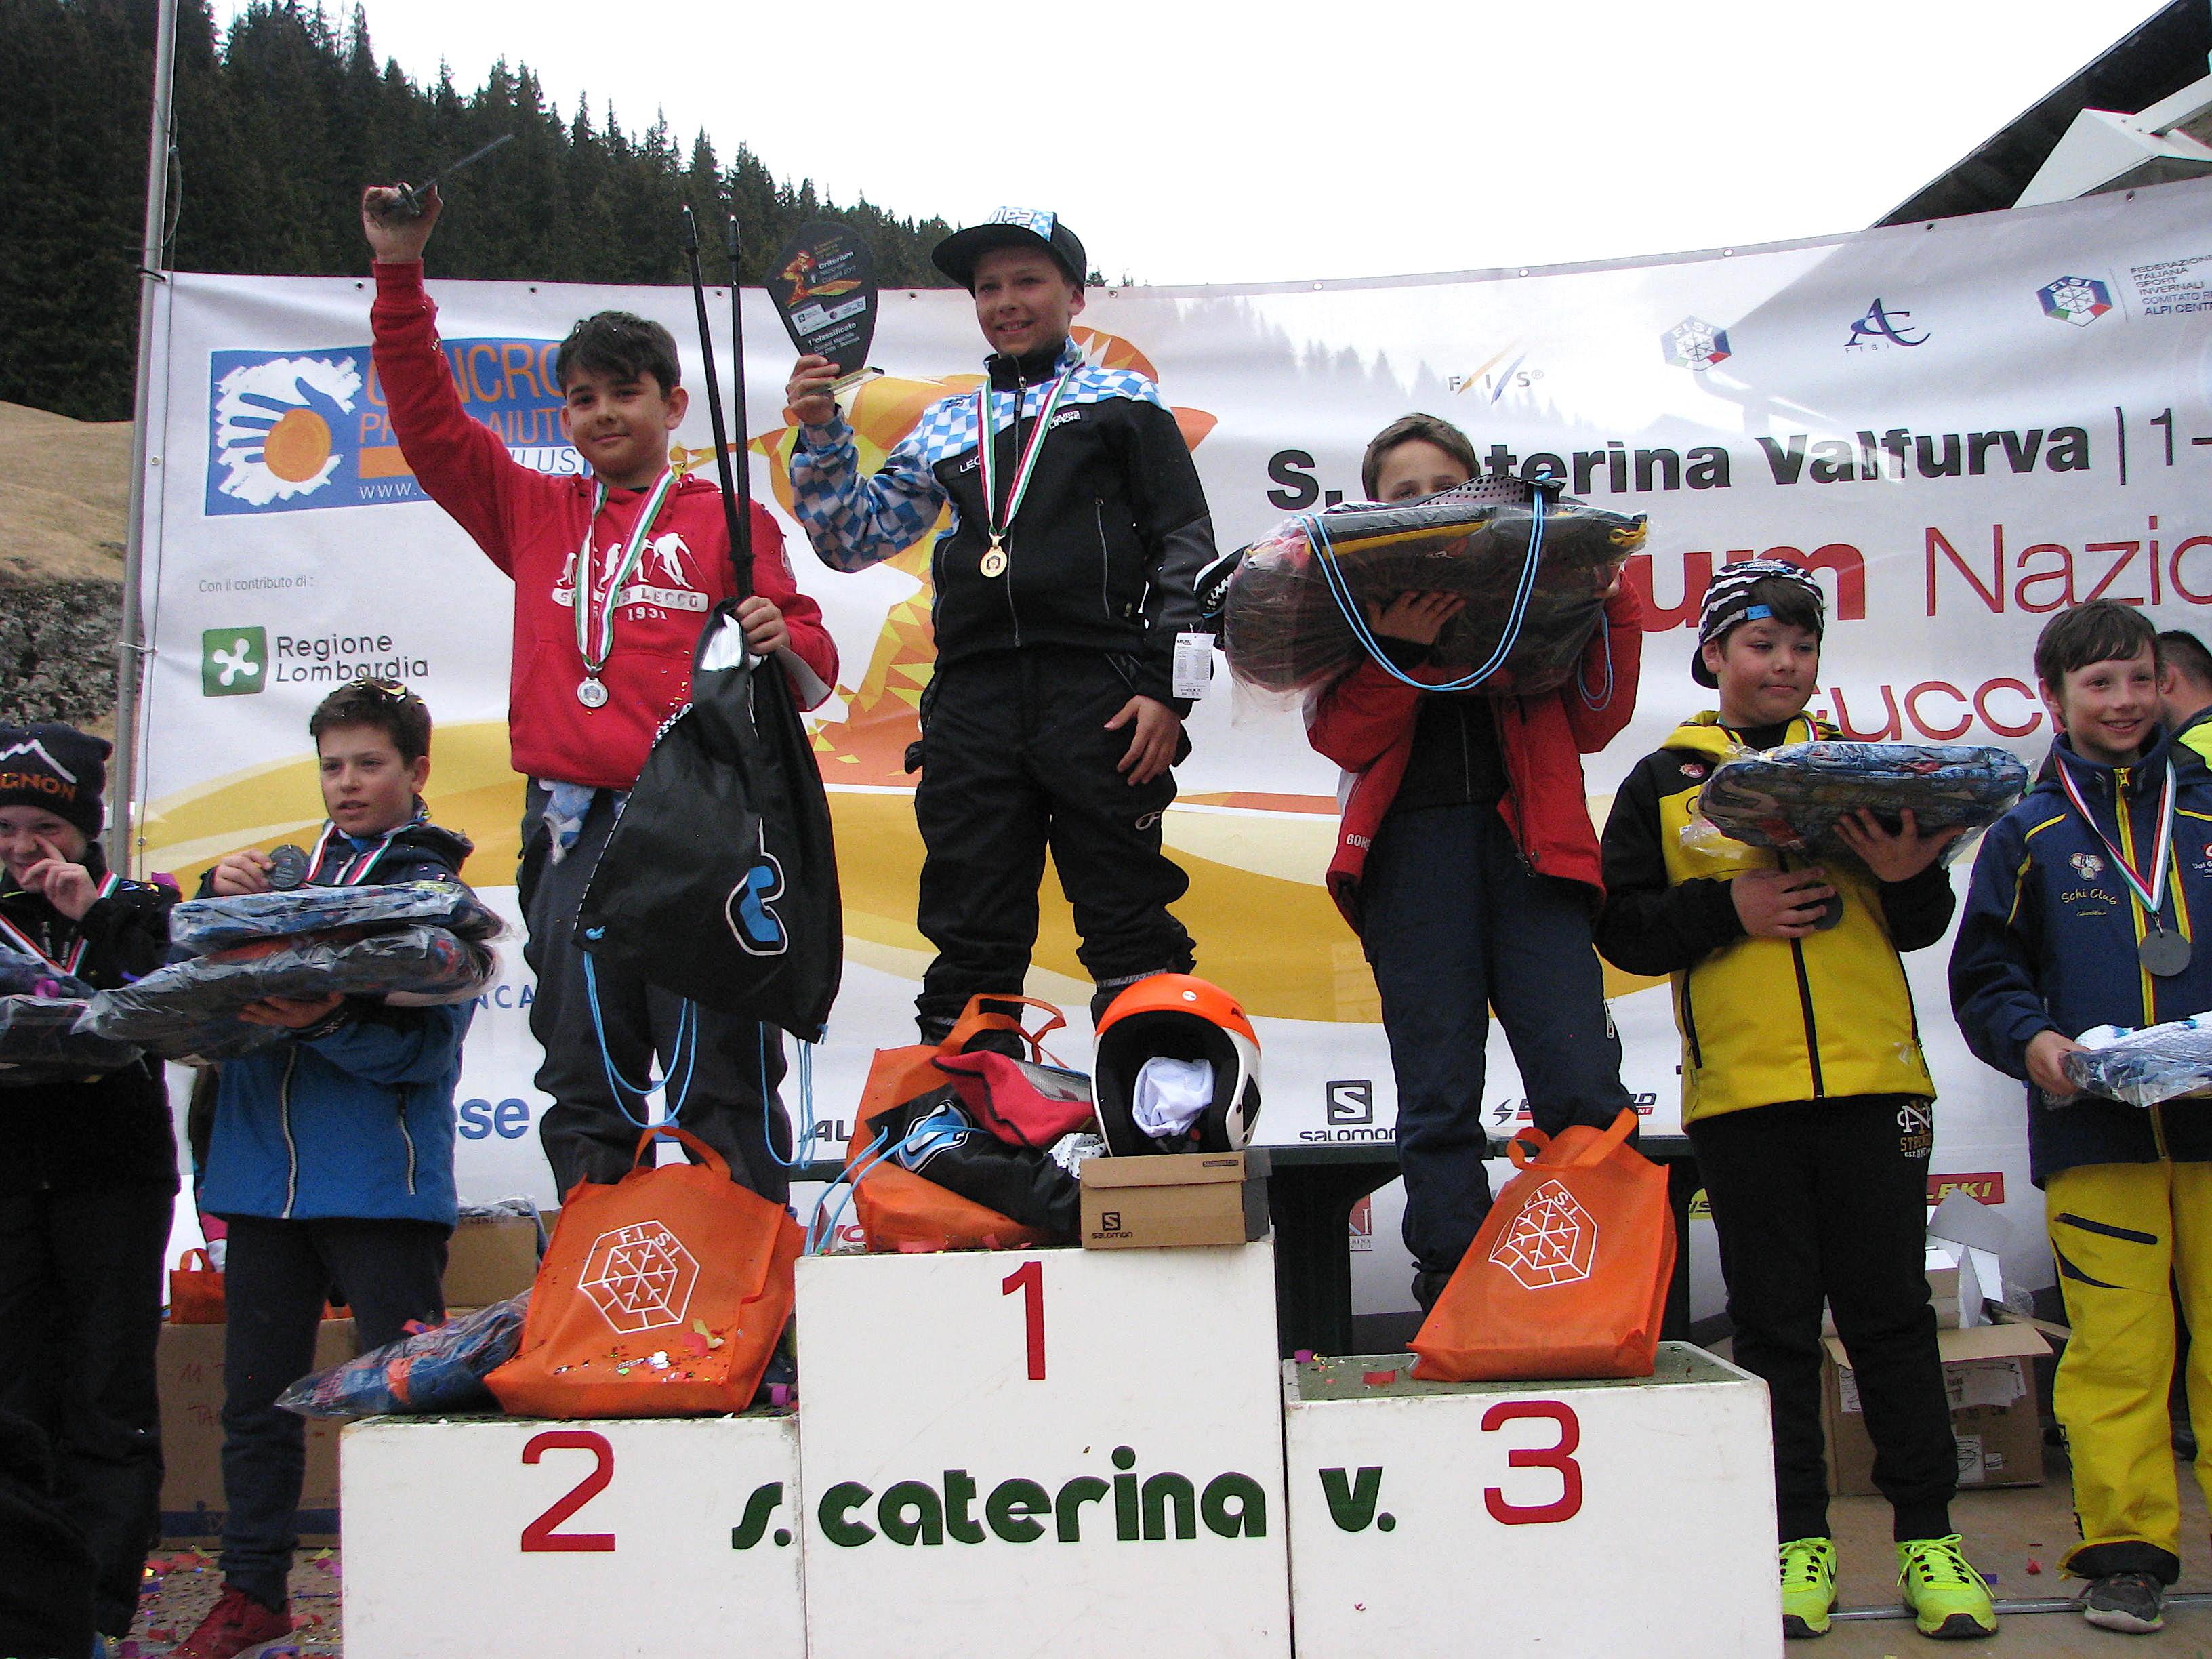 Podio maschile skicross 2005